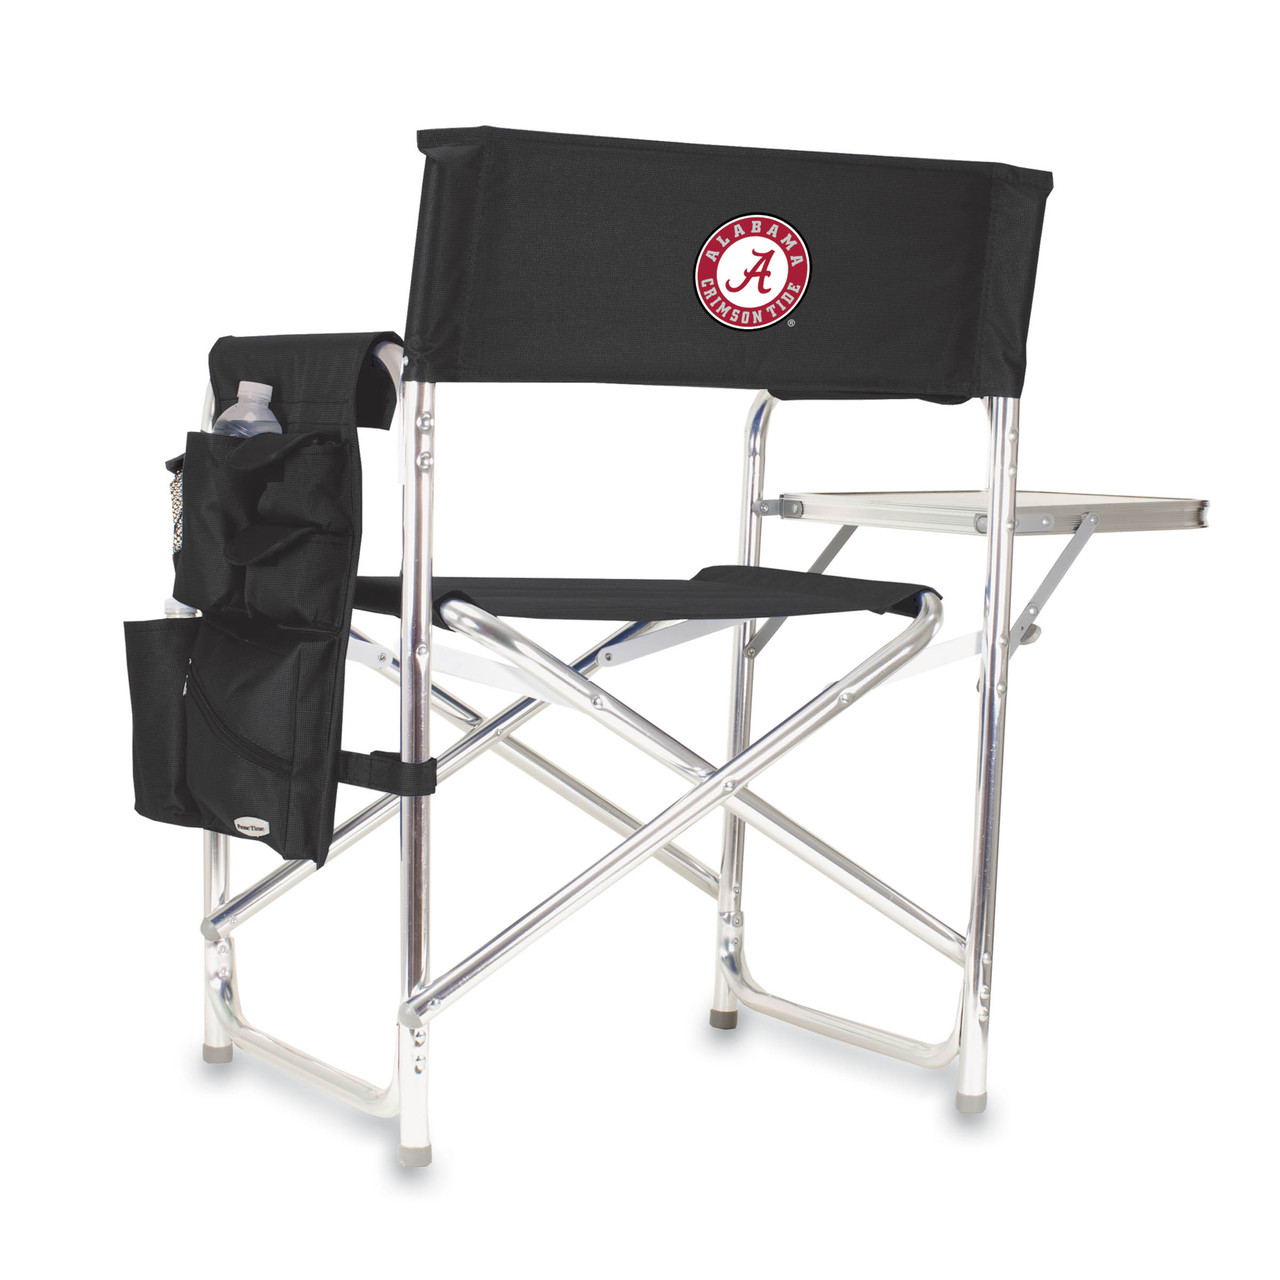 Sports Chair - University of Alabama